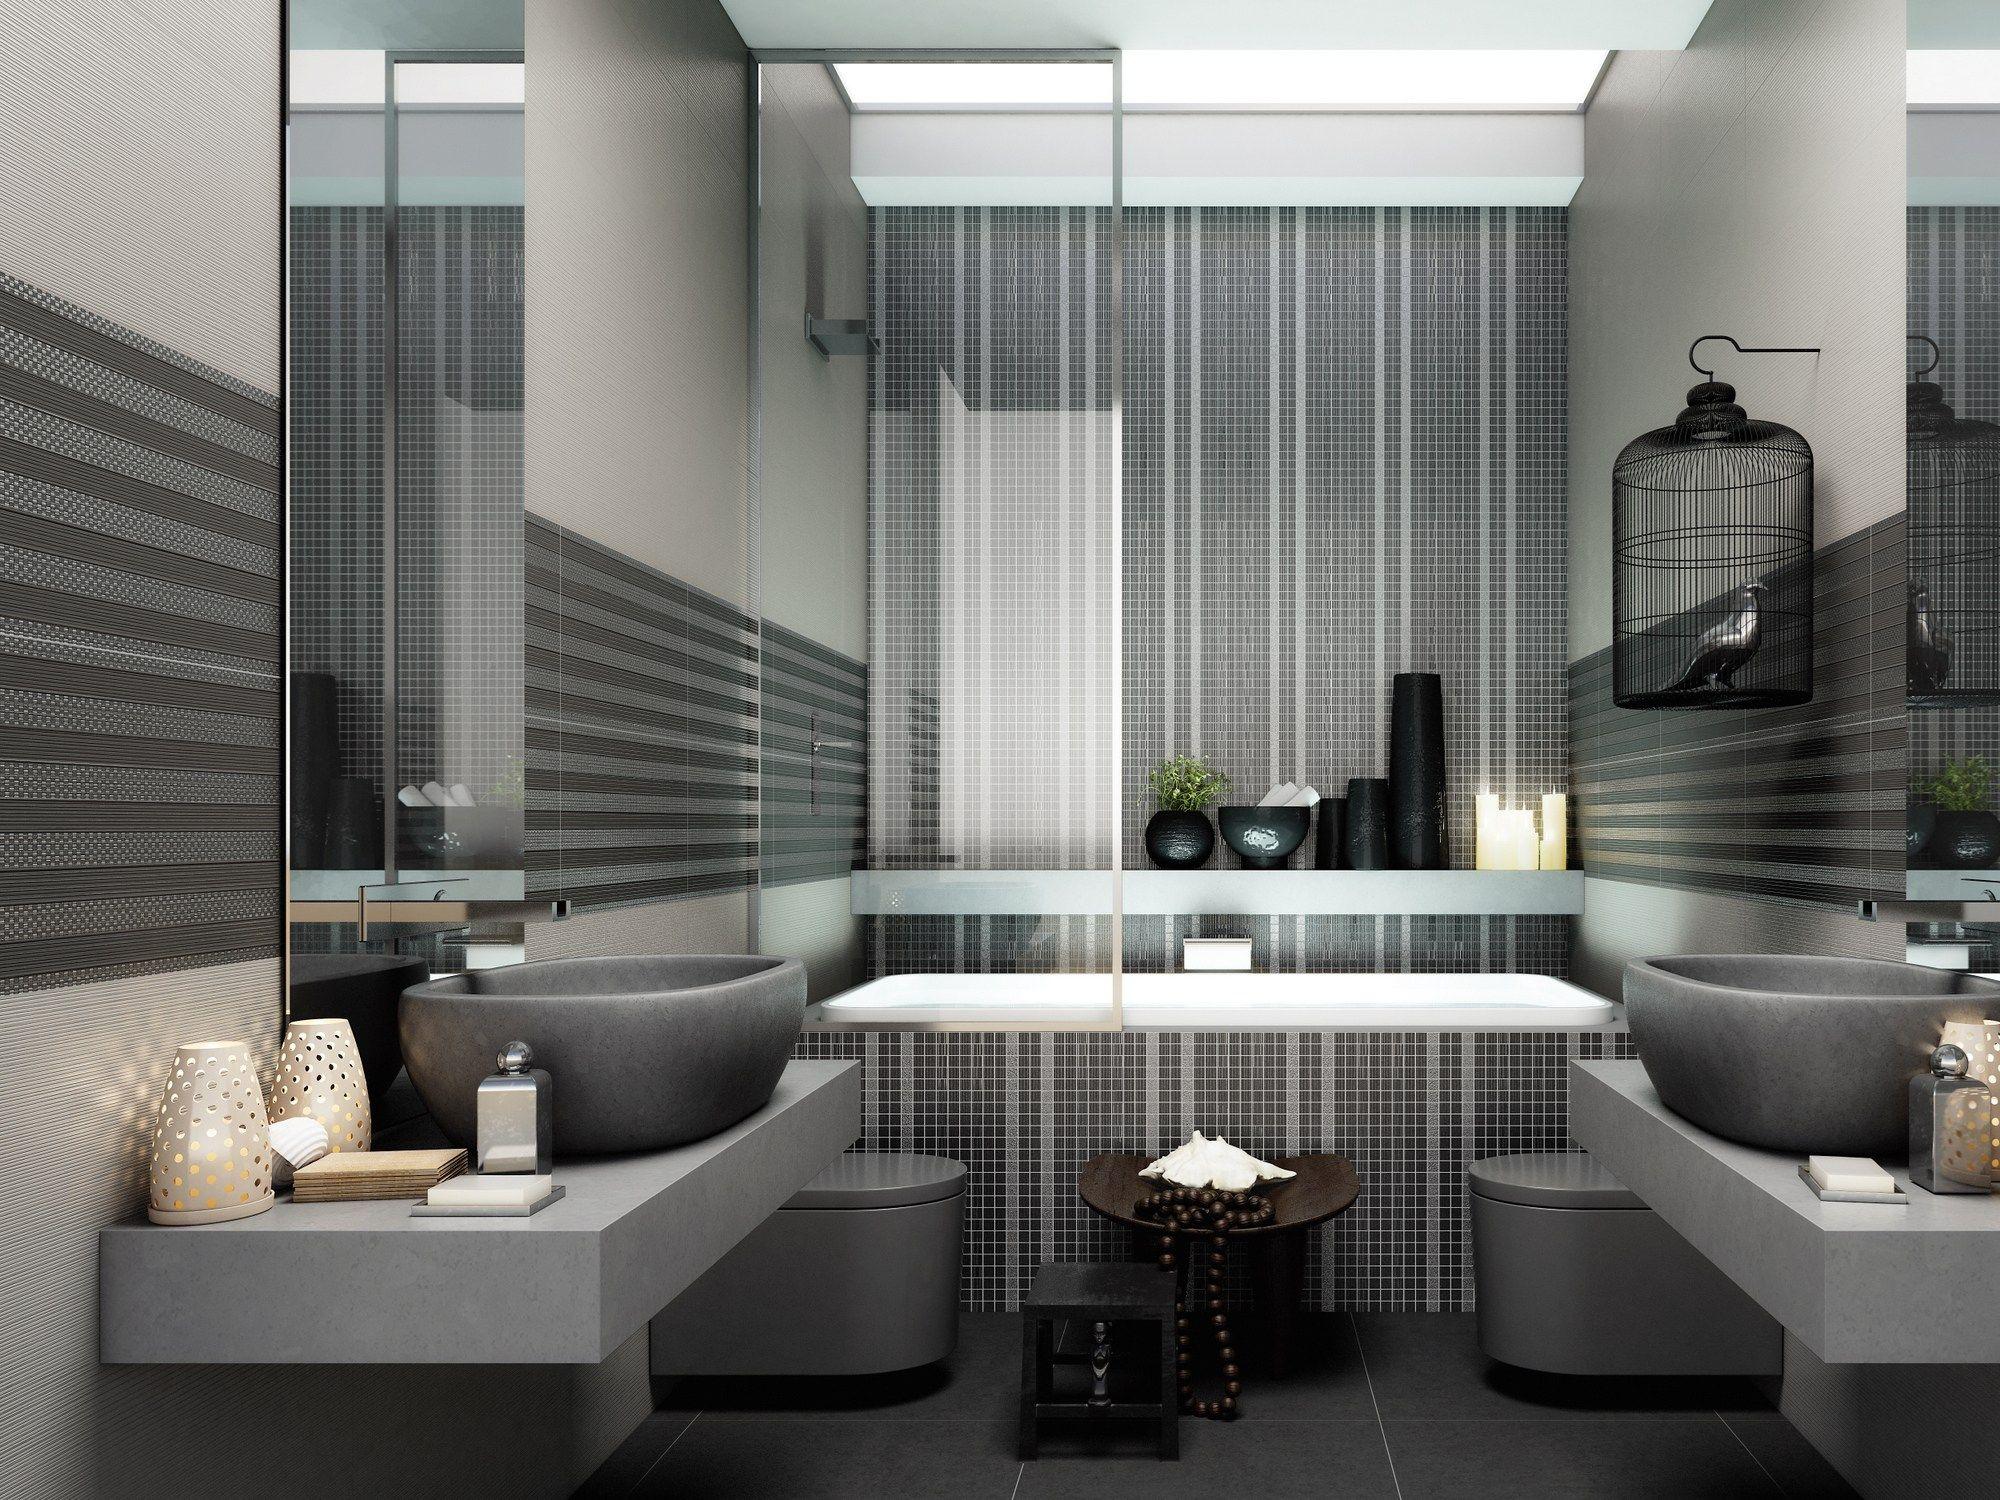 LUXURY | Rivestimento Collezione Luxury By Marca Corona